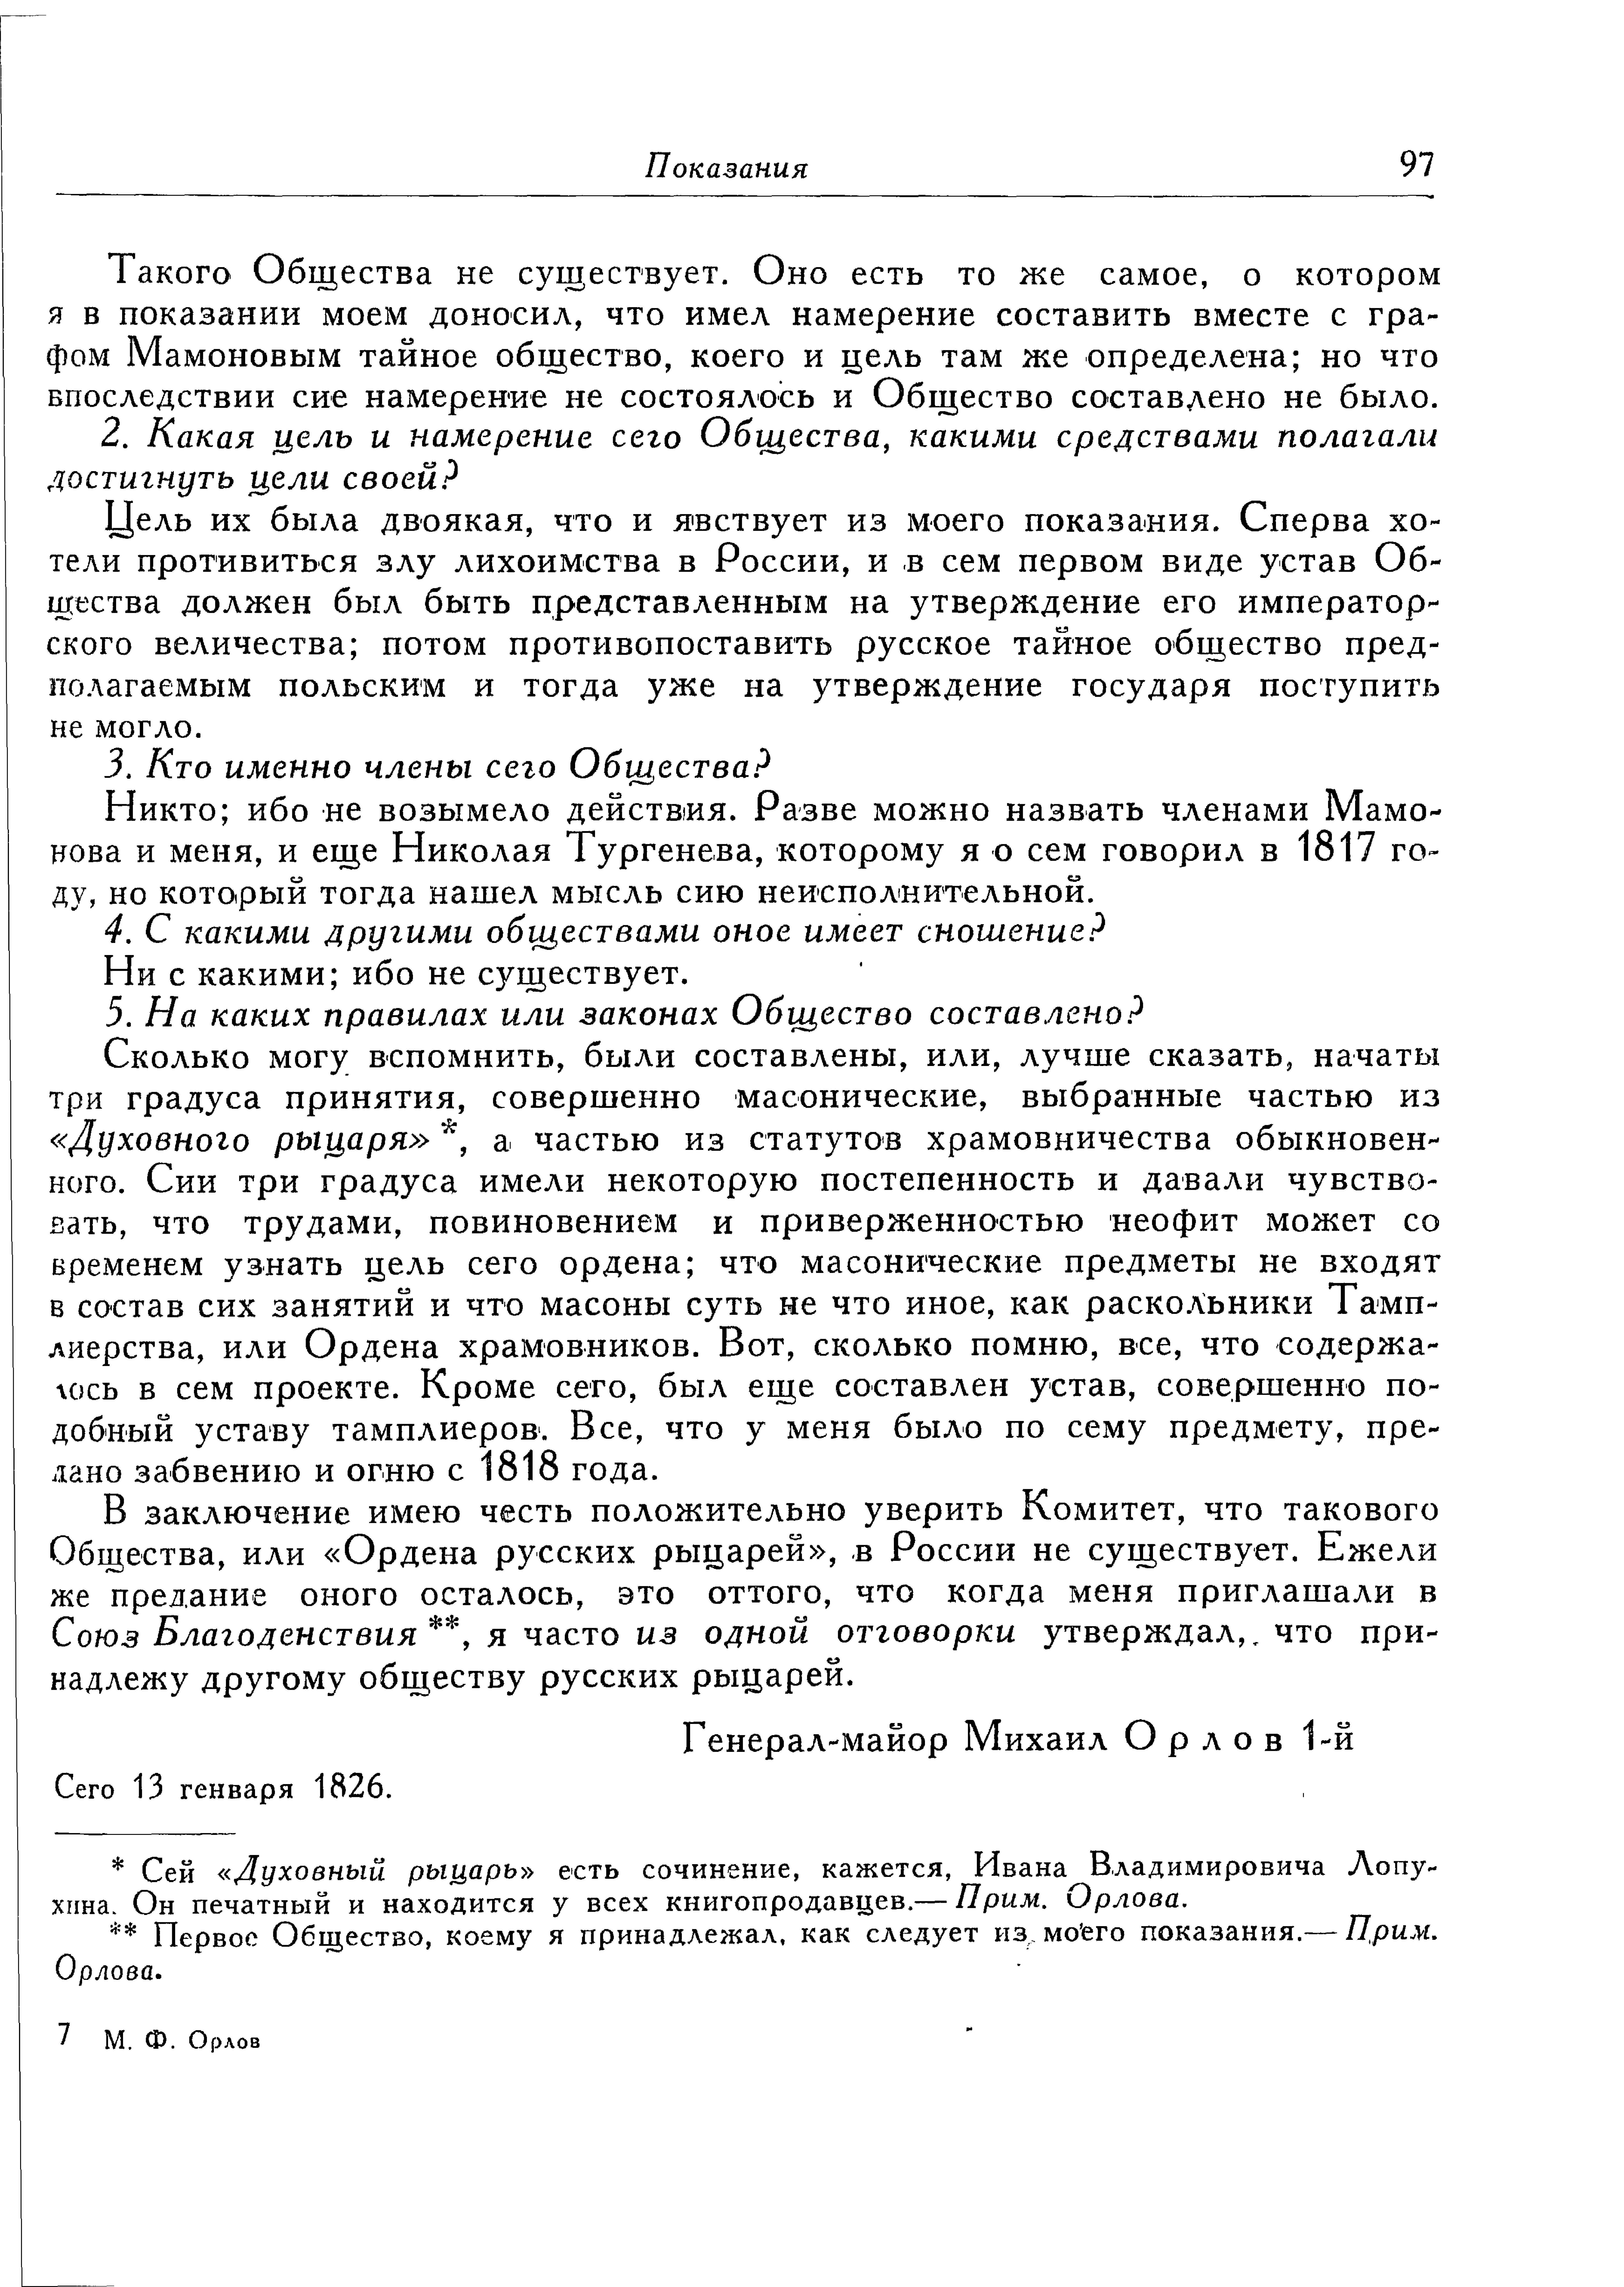 https://forumupload.ru/uploads/0019/93/b0/4/150205.png